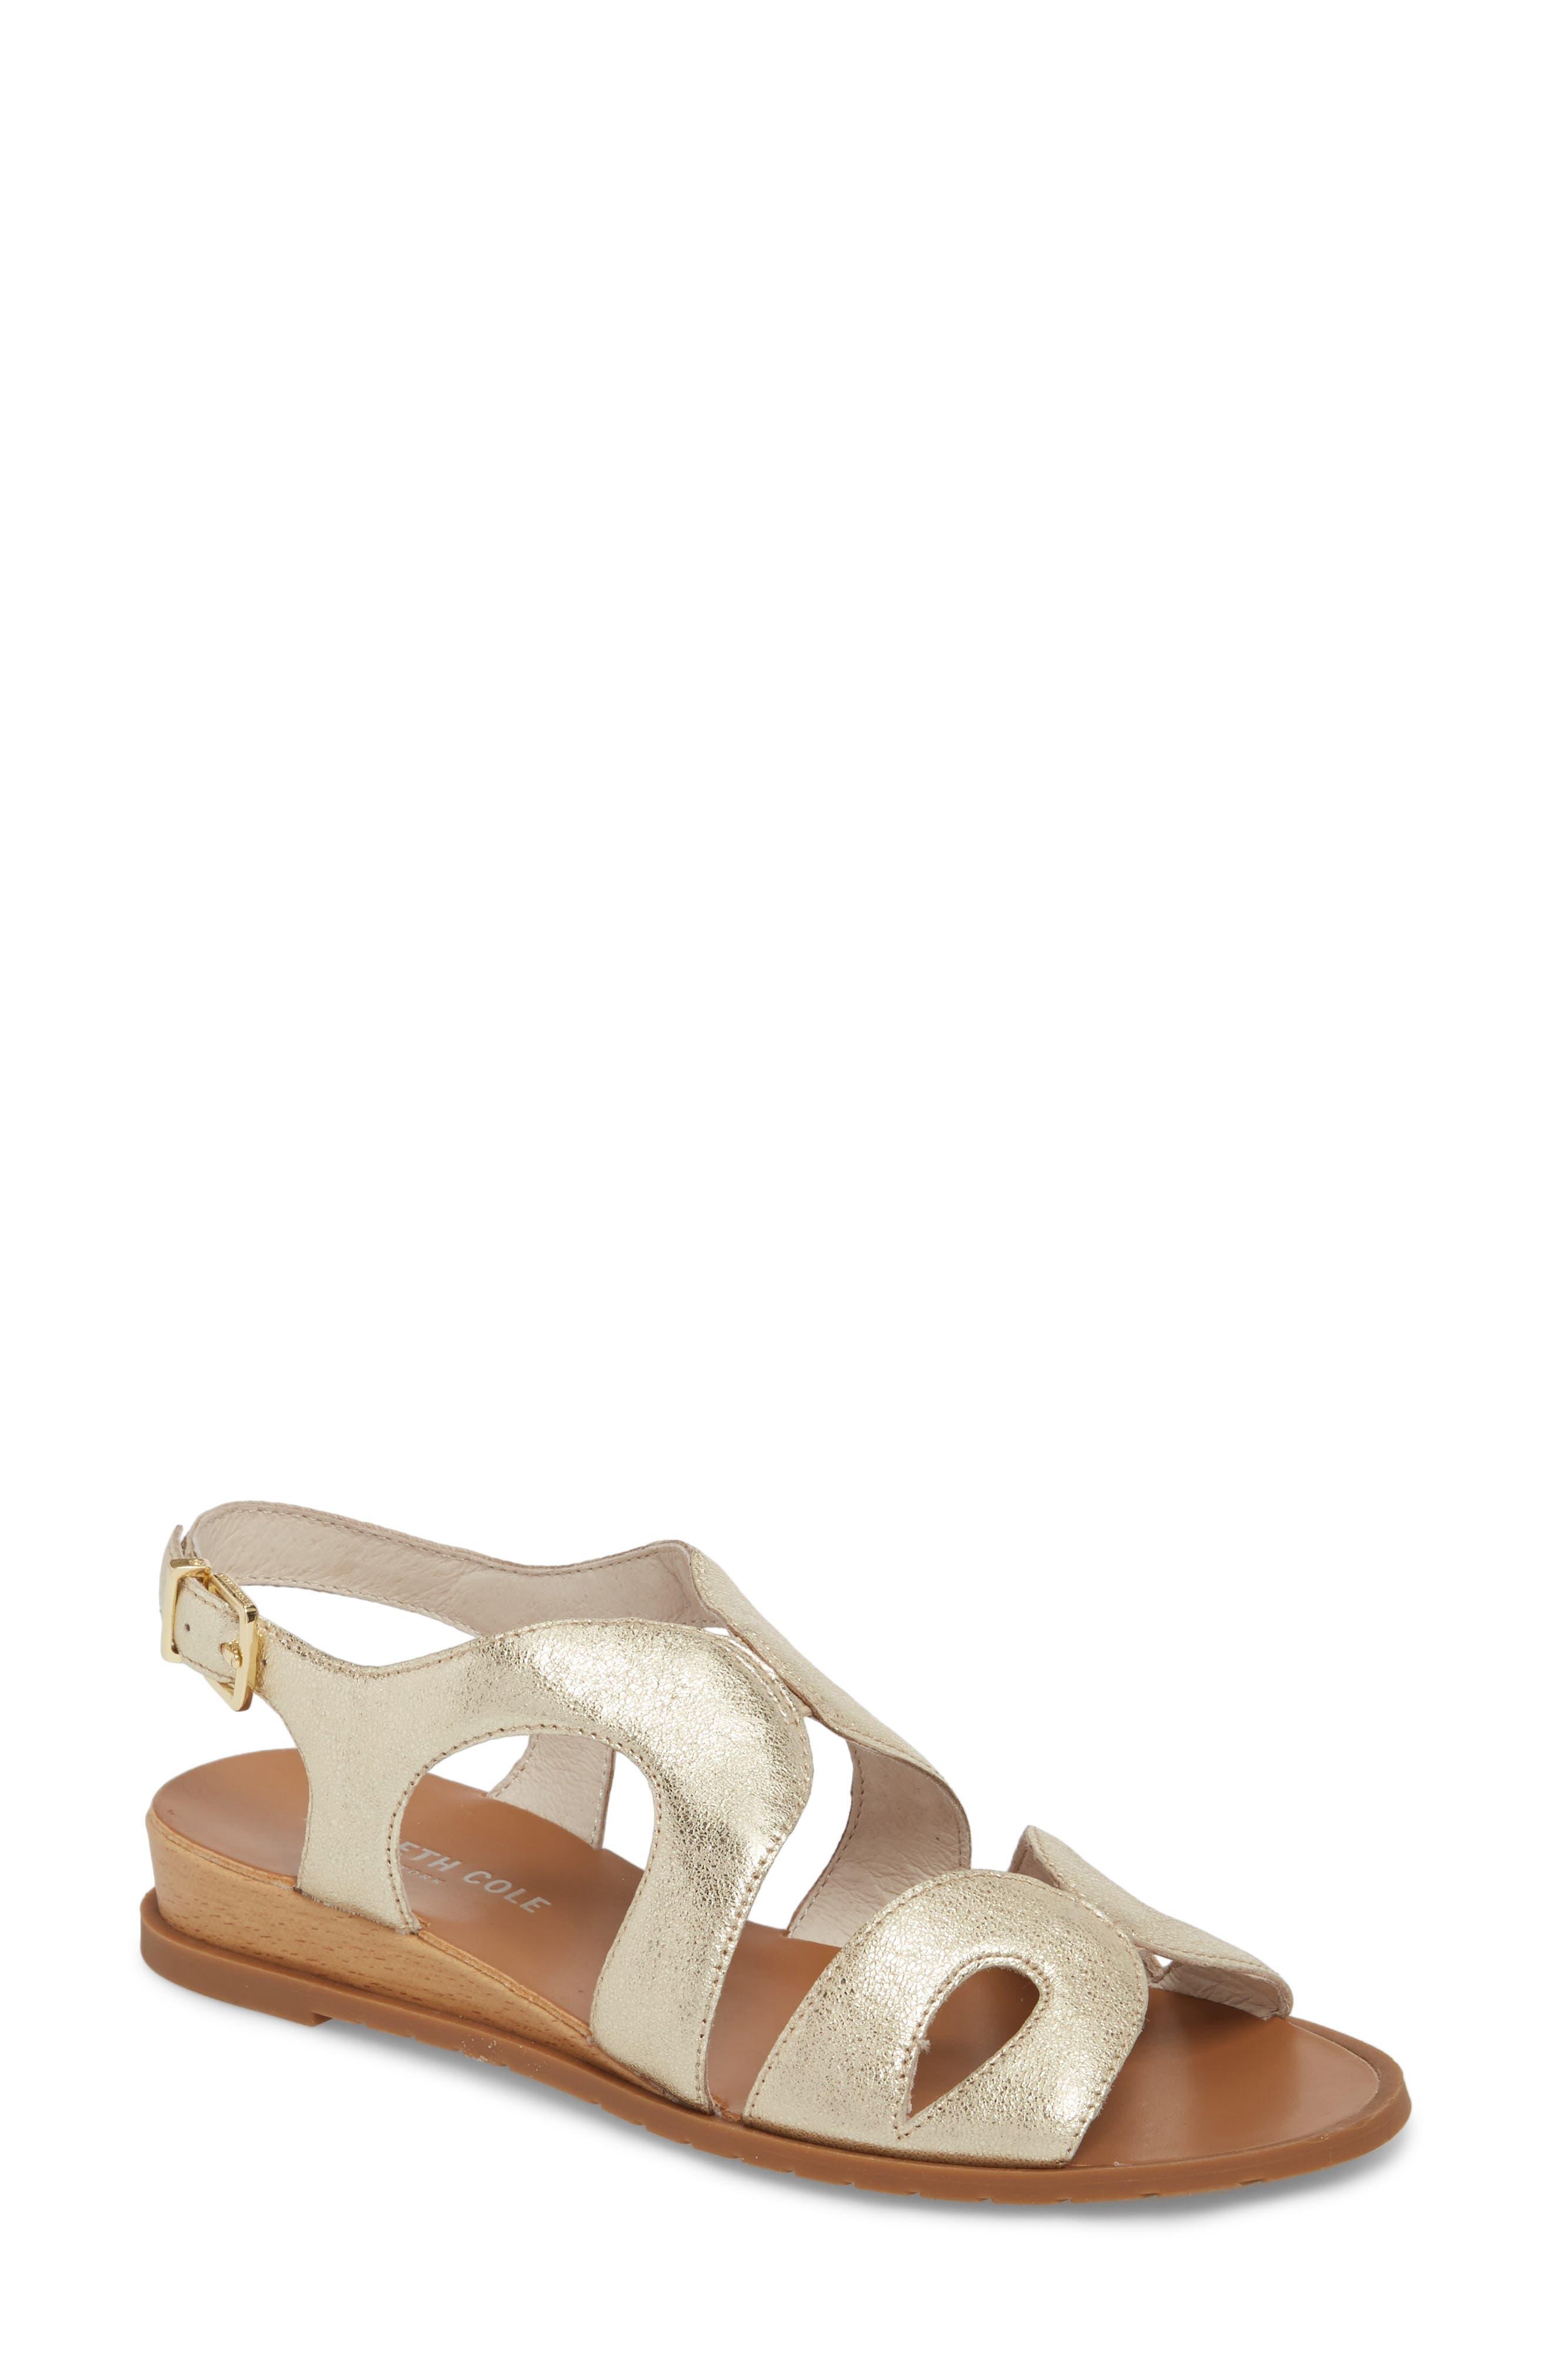 Jules Sandal,                         Main,                         color, Soft Gold Metallic Leather